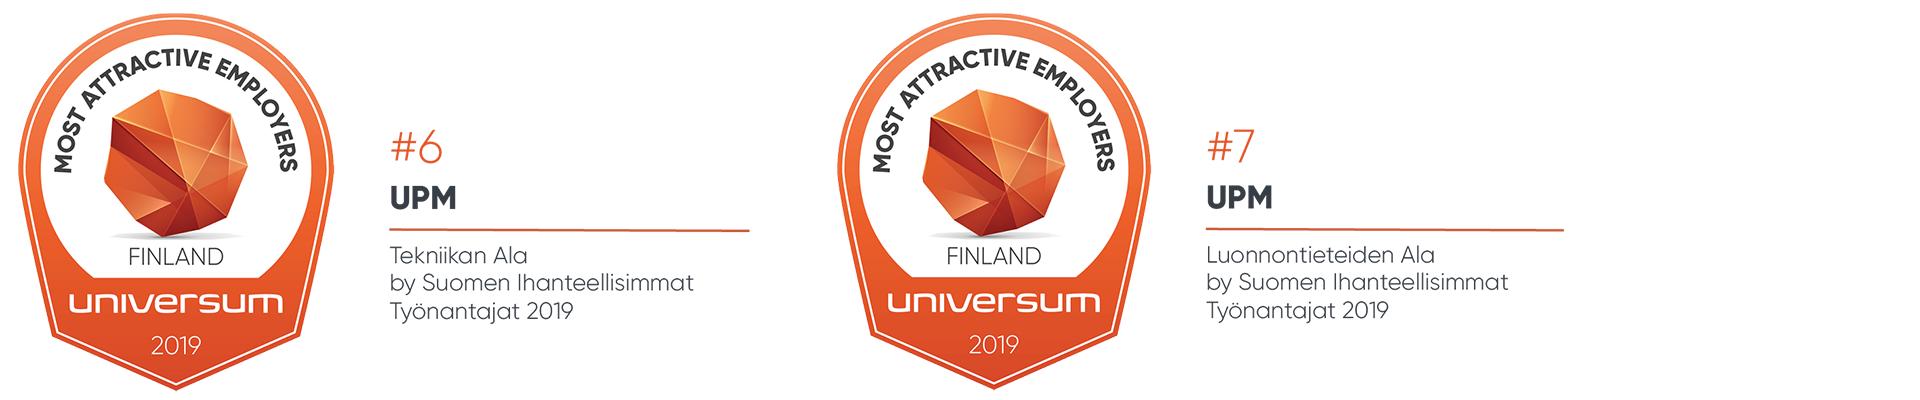 Universum_Badges.png